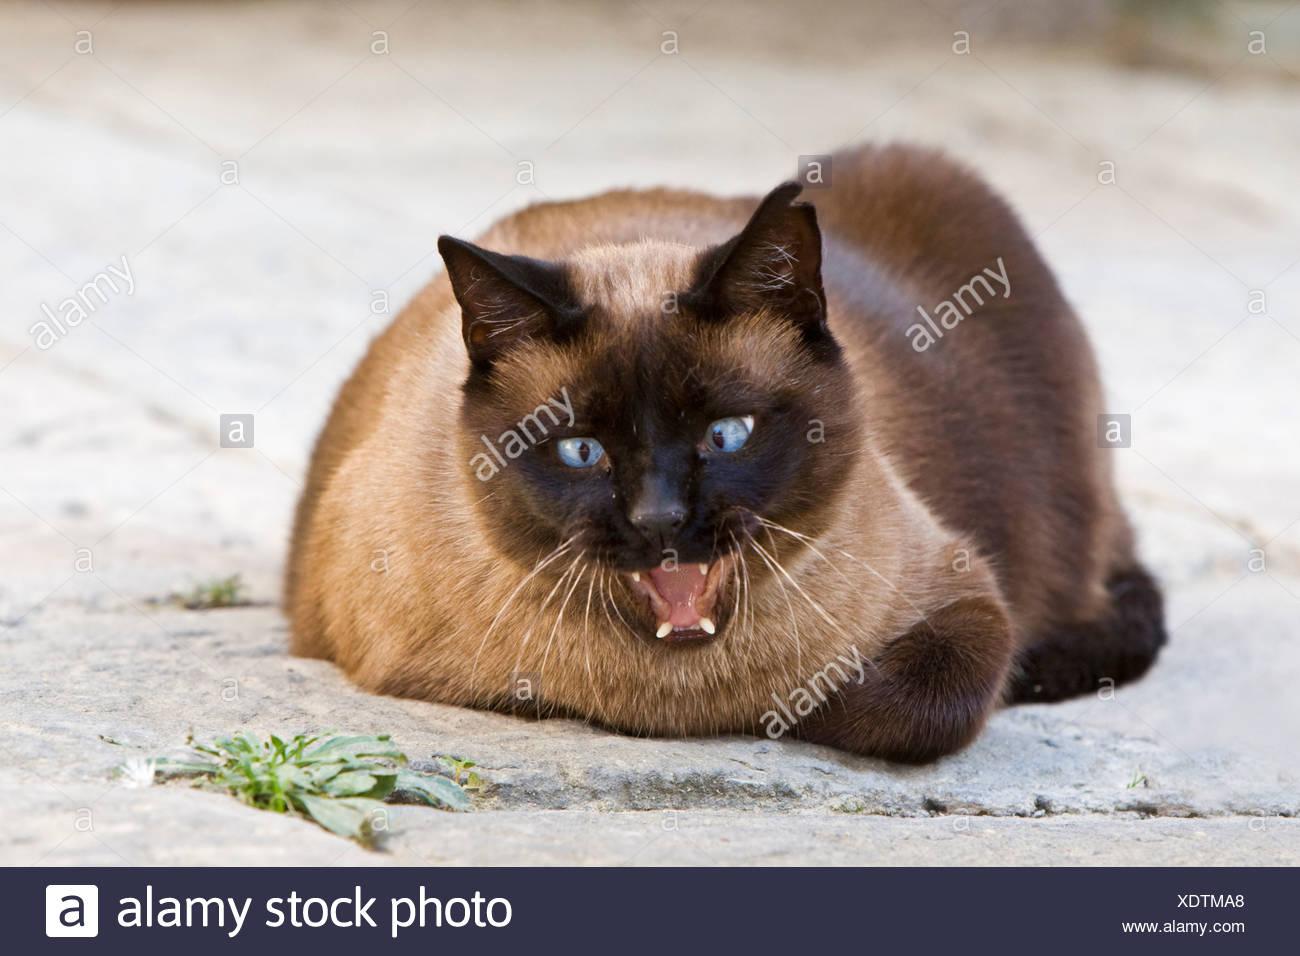 Siamese cat yawning, portrait - Stock Image